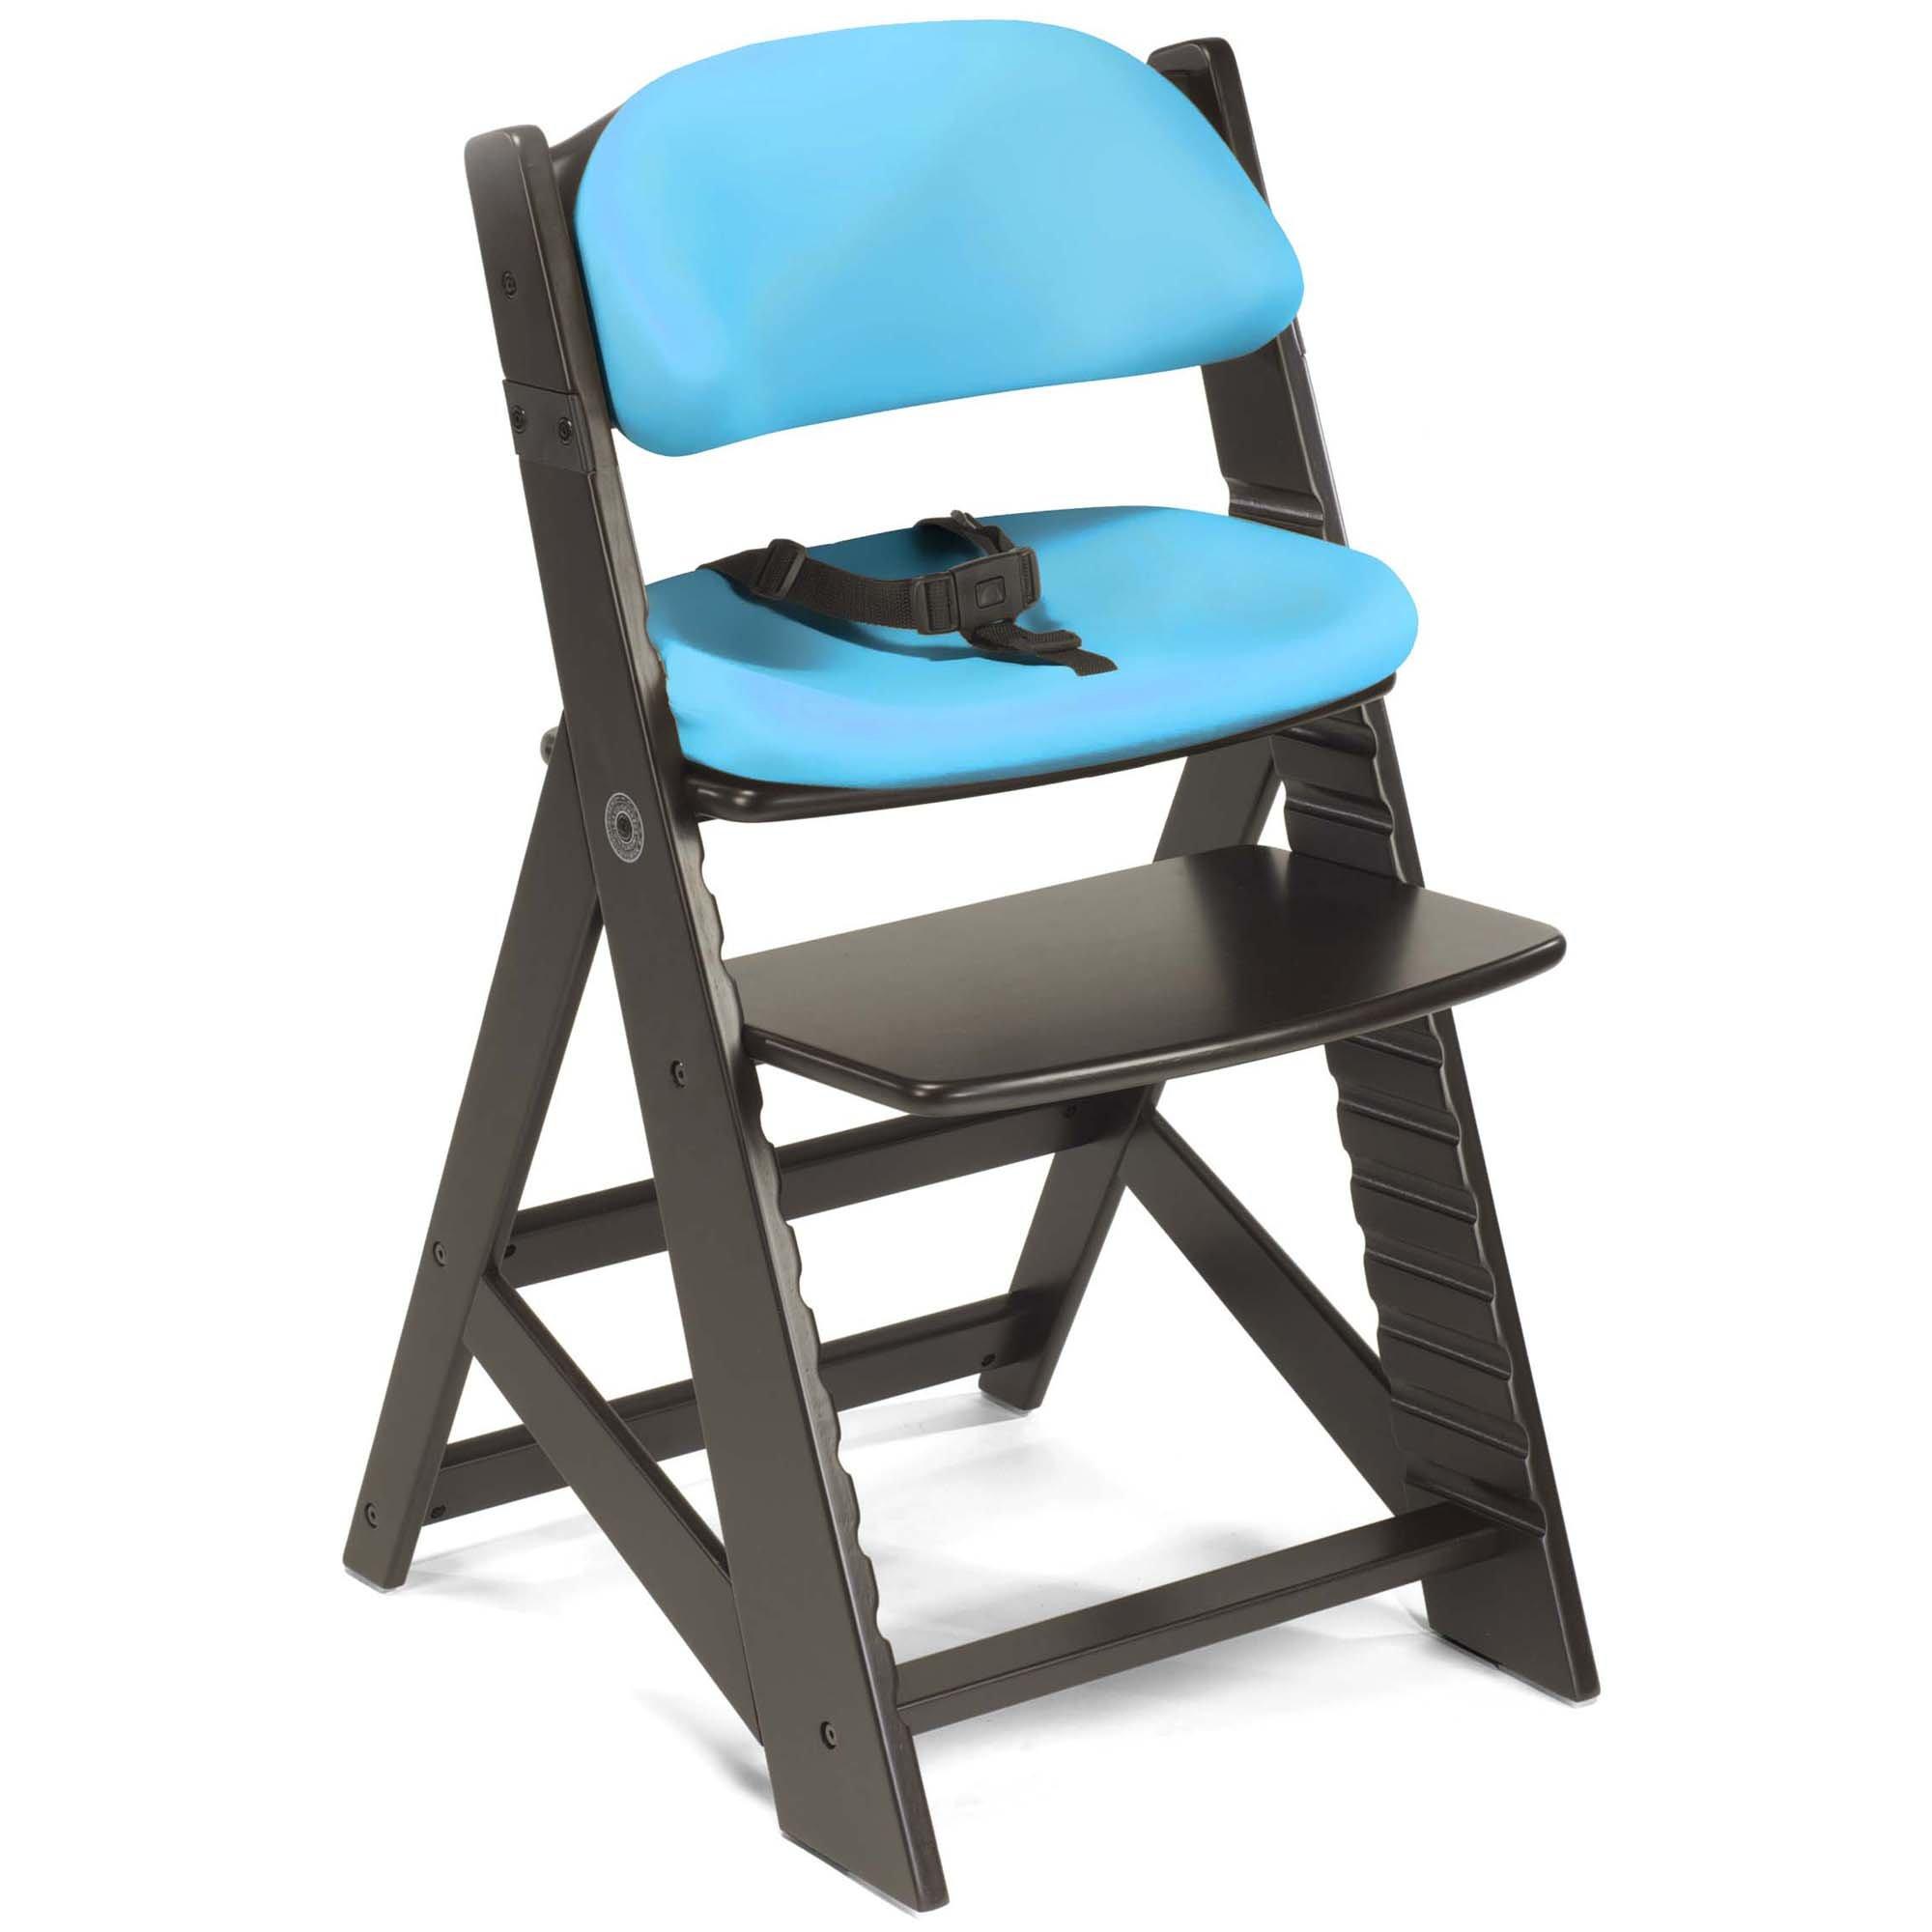 Keekaroo Height Right Kids Chair with Comfort Cushions - Aqua - Espresso Base